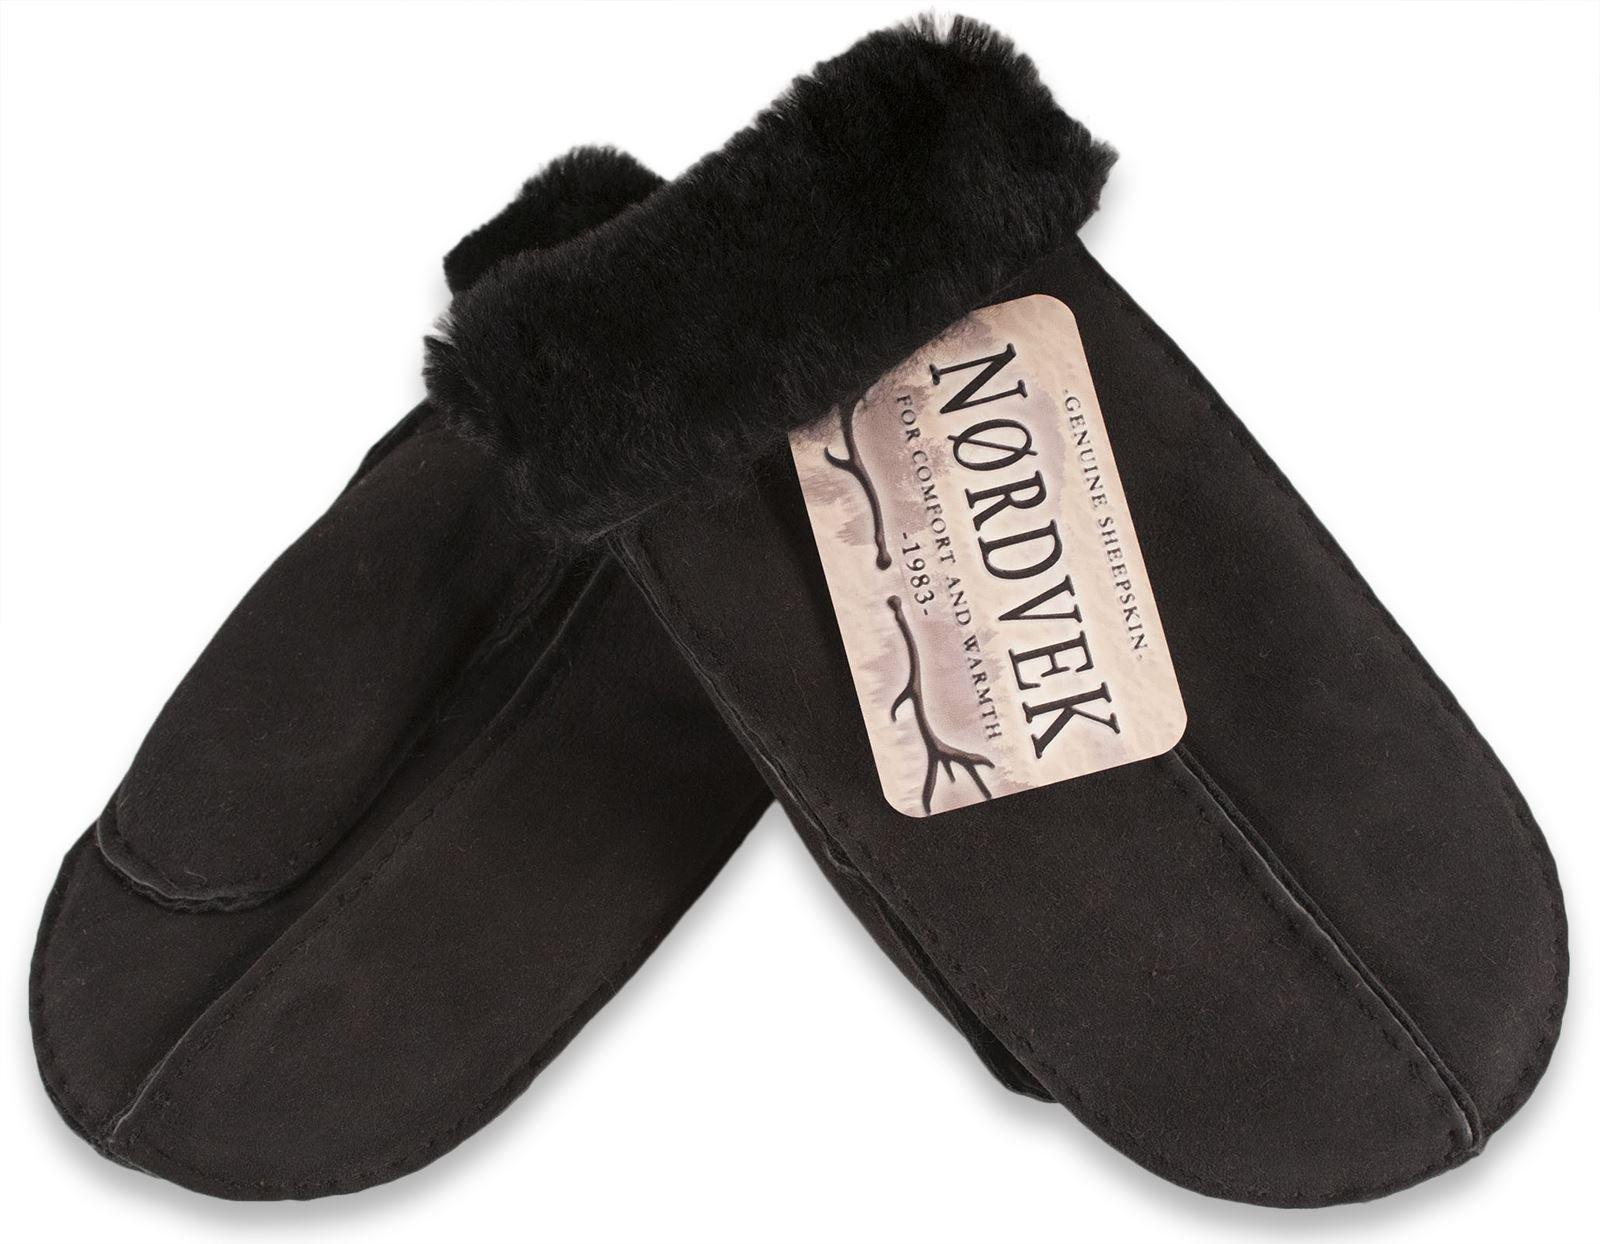 Nordvek Women's Sheepskin Mittens # 315-100